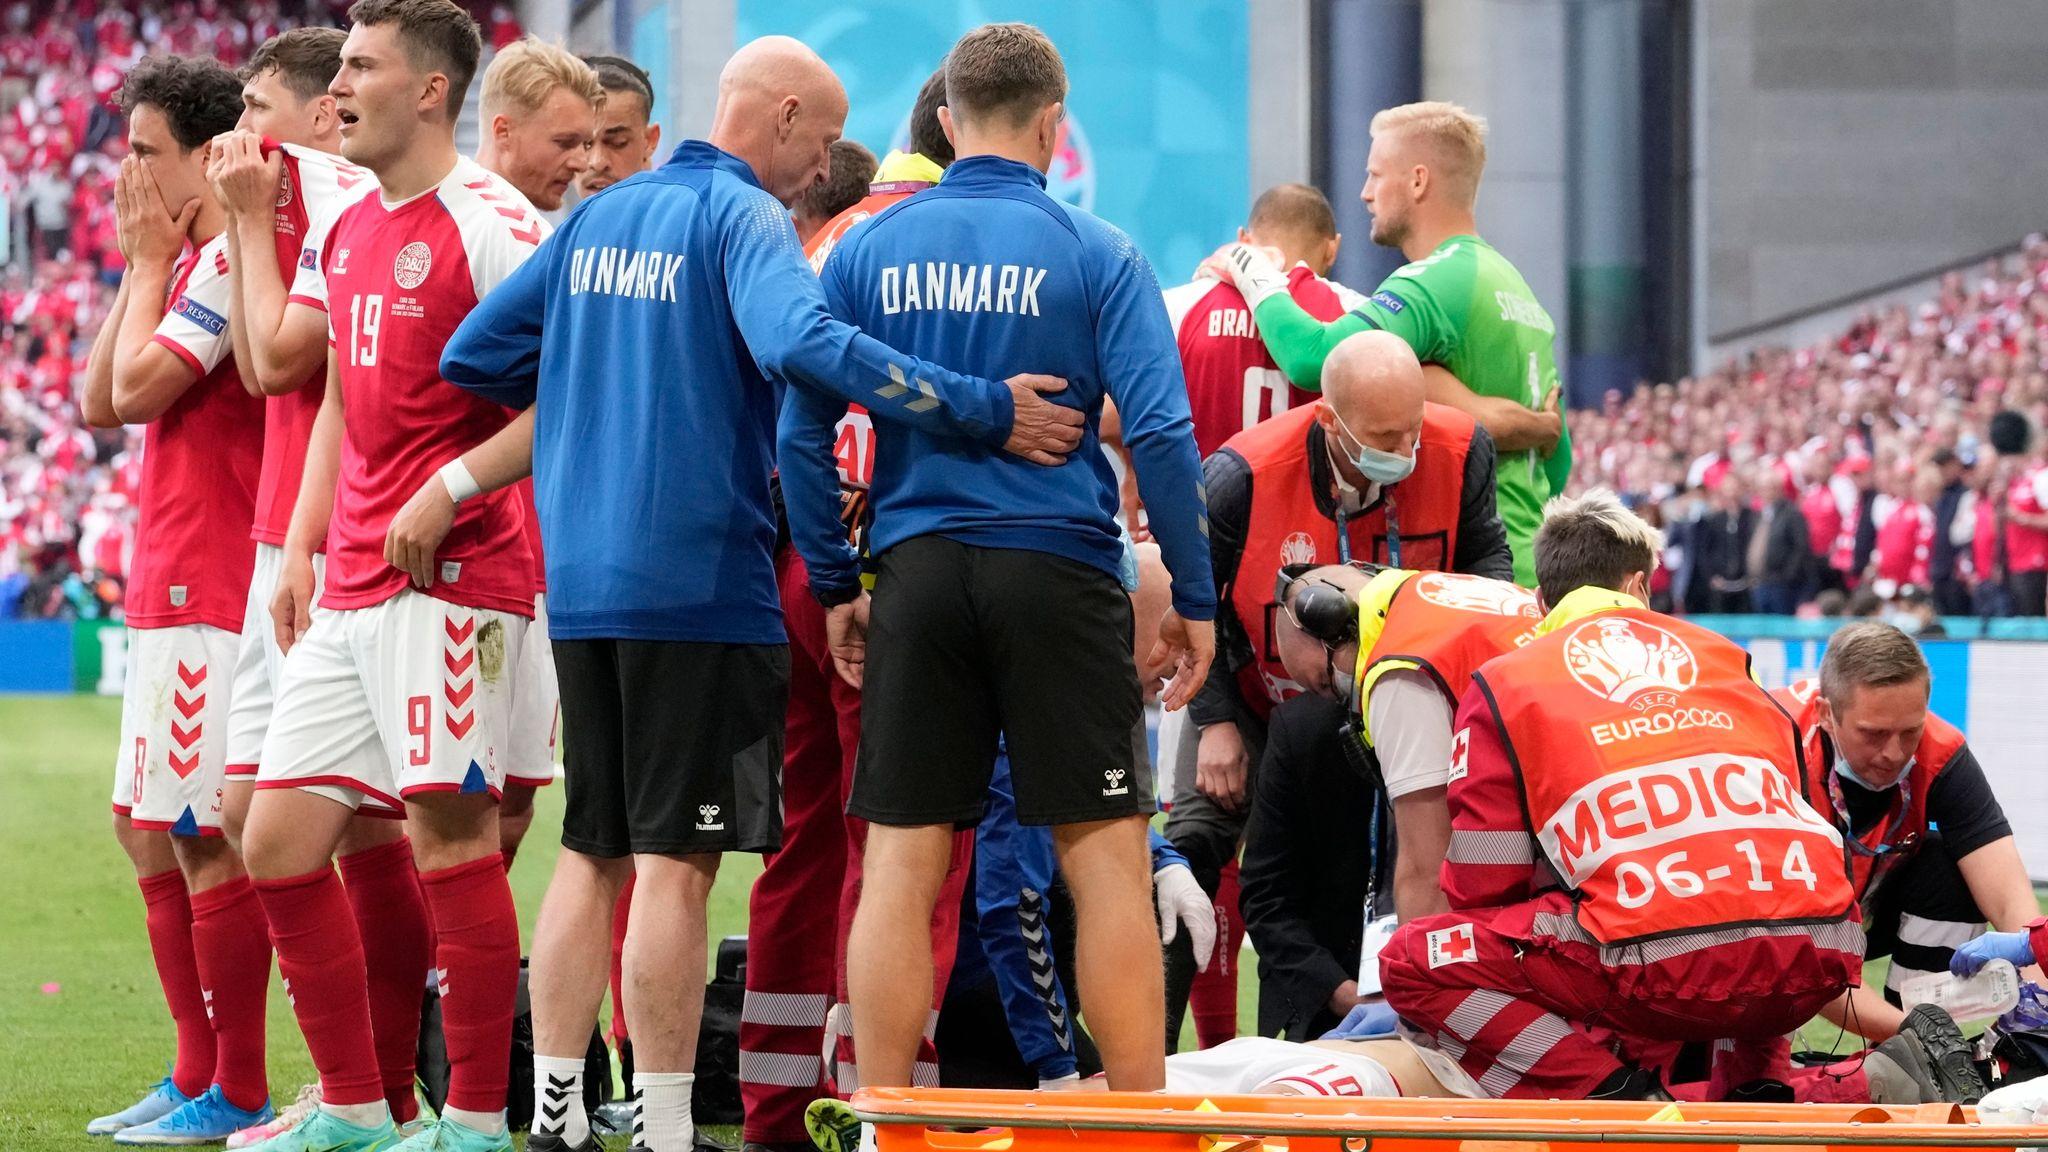 Christian Eriksen: Swift medical response crucial but more ...